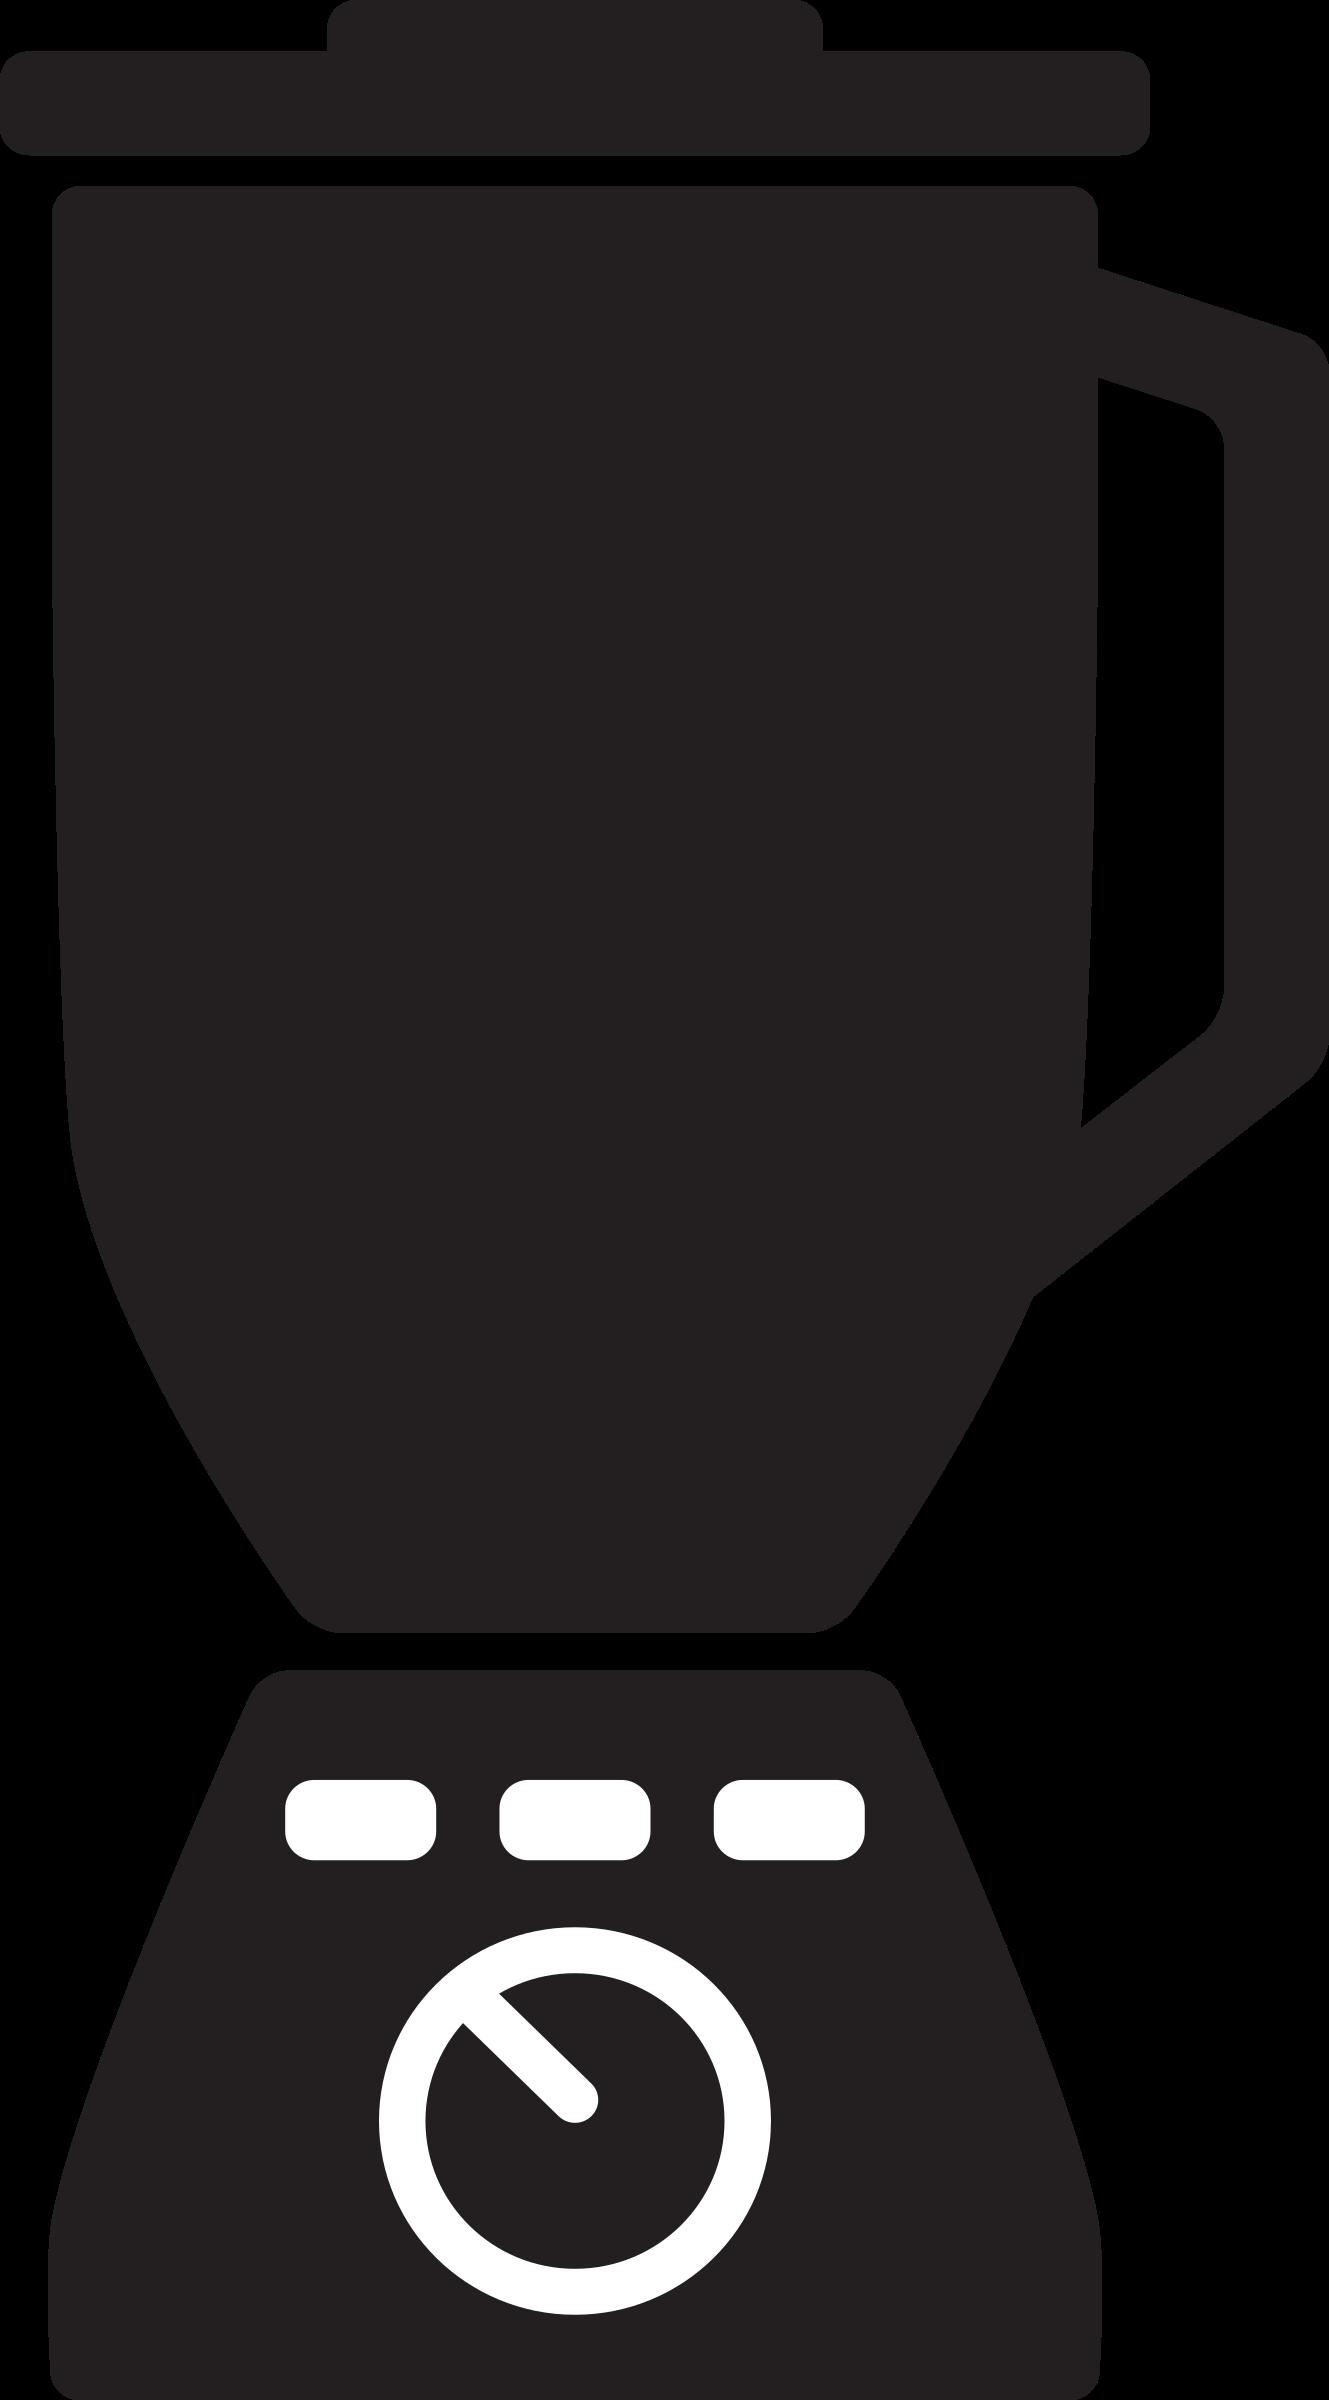 vector de poynting ejemplos EKI9BAI